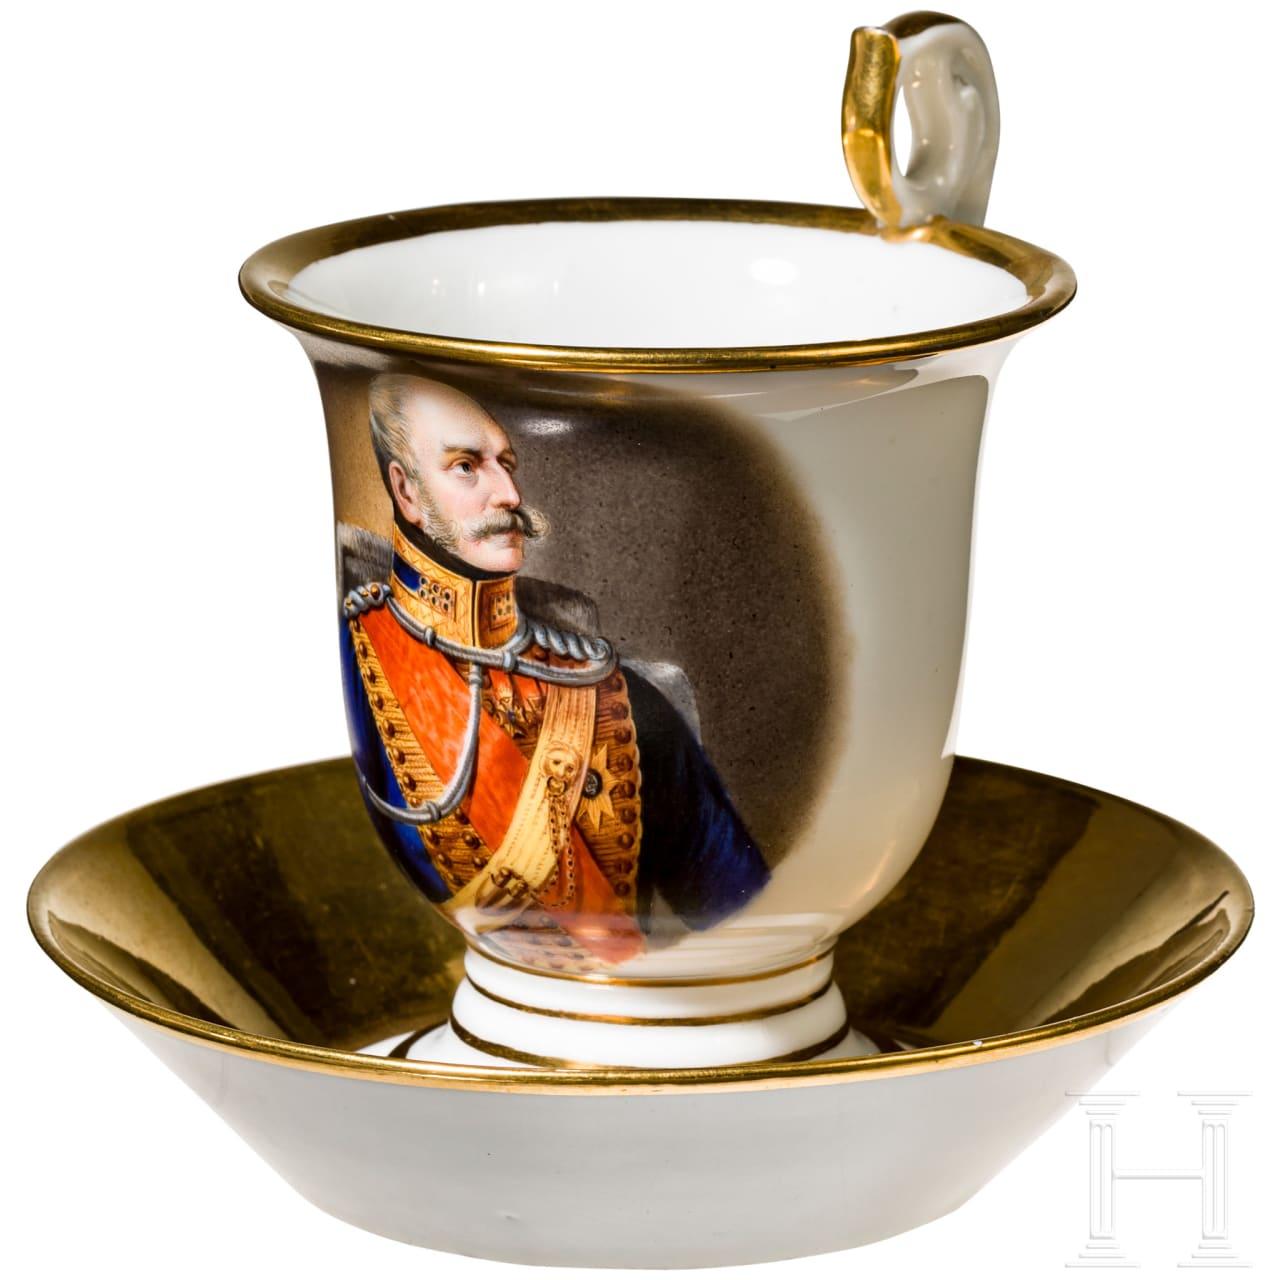 Ernst August I, King of Hanover - portrait cup, c. 1840